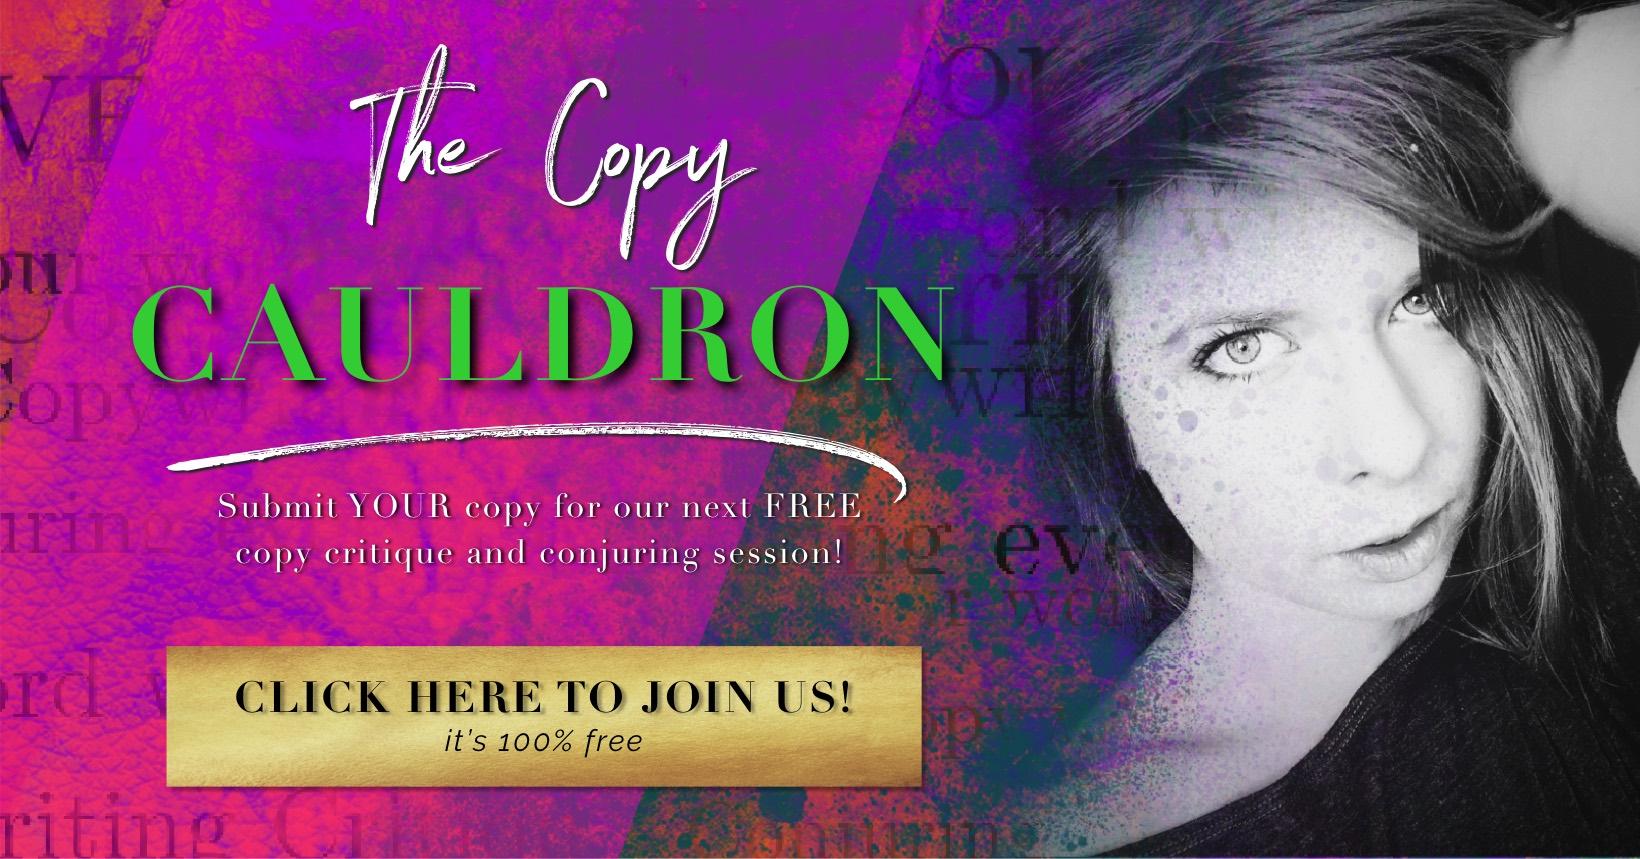 The Copy Coven and Cauldron.jpeg